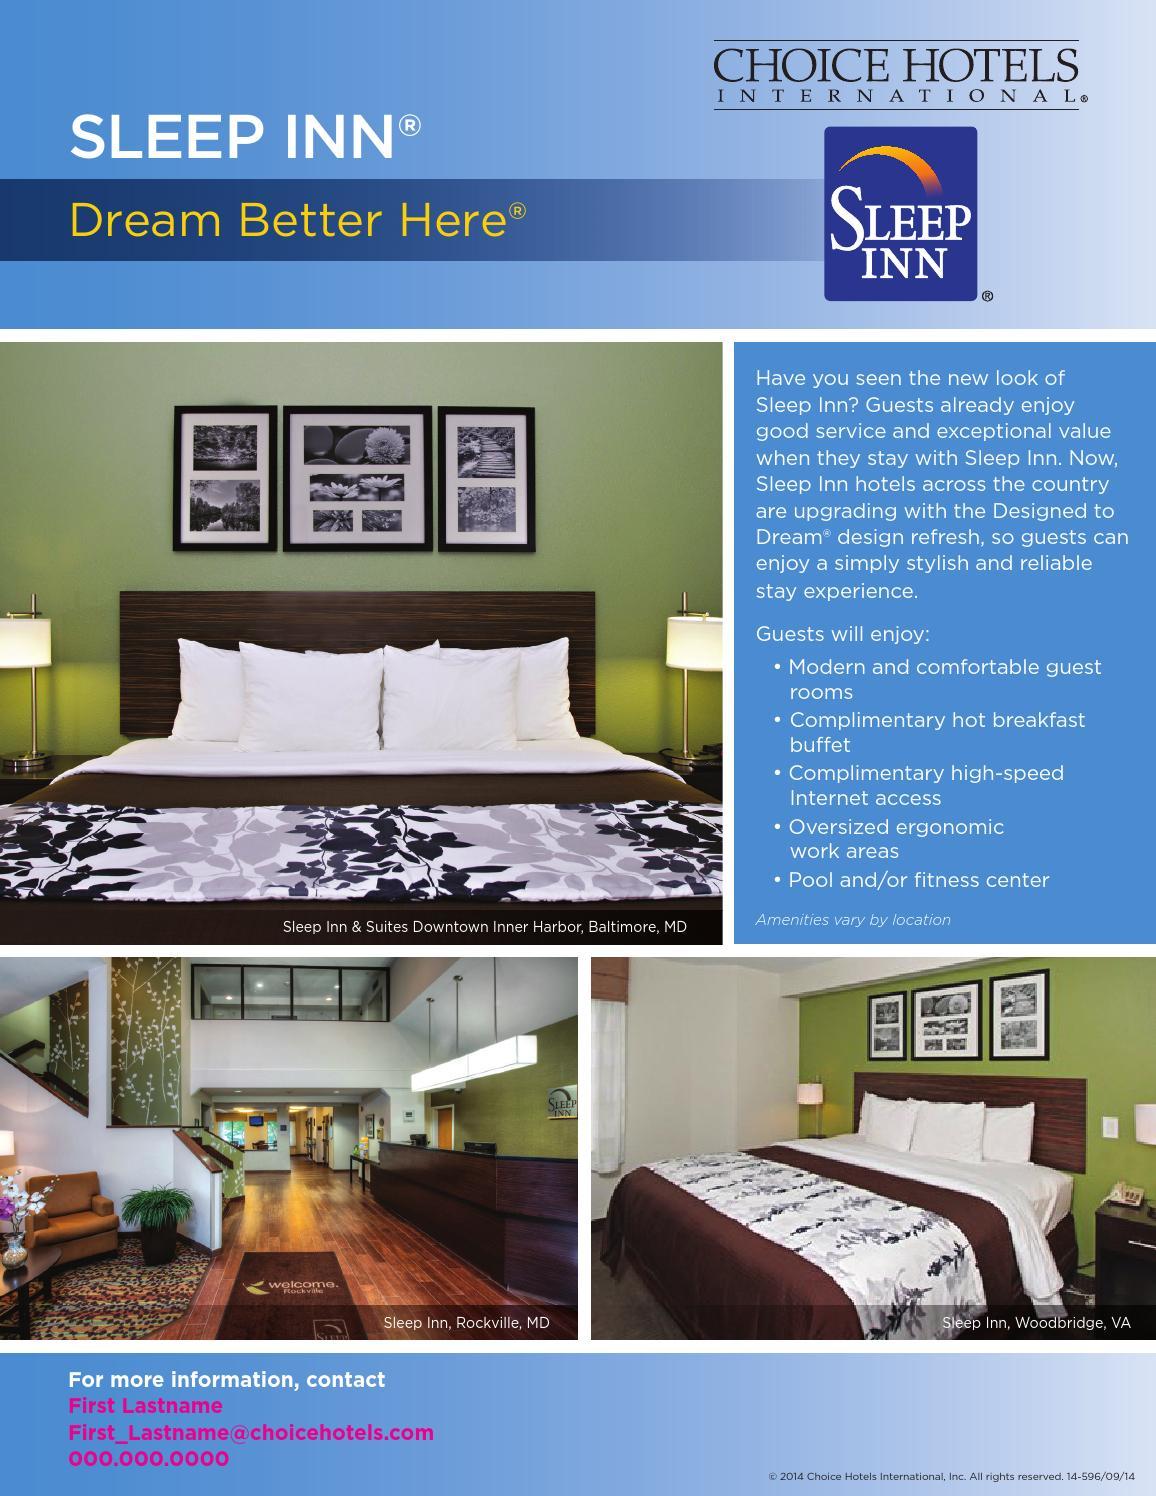 Sleep Inn Brand Dc Metropolitan Area By Choice Hotels International Issuu